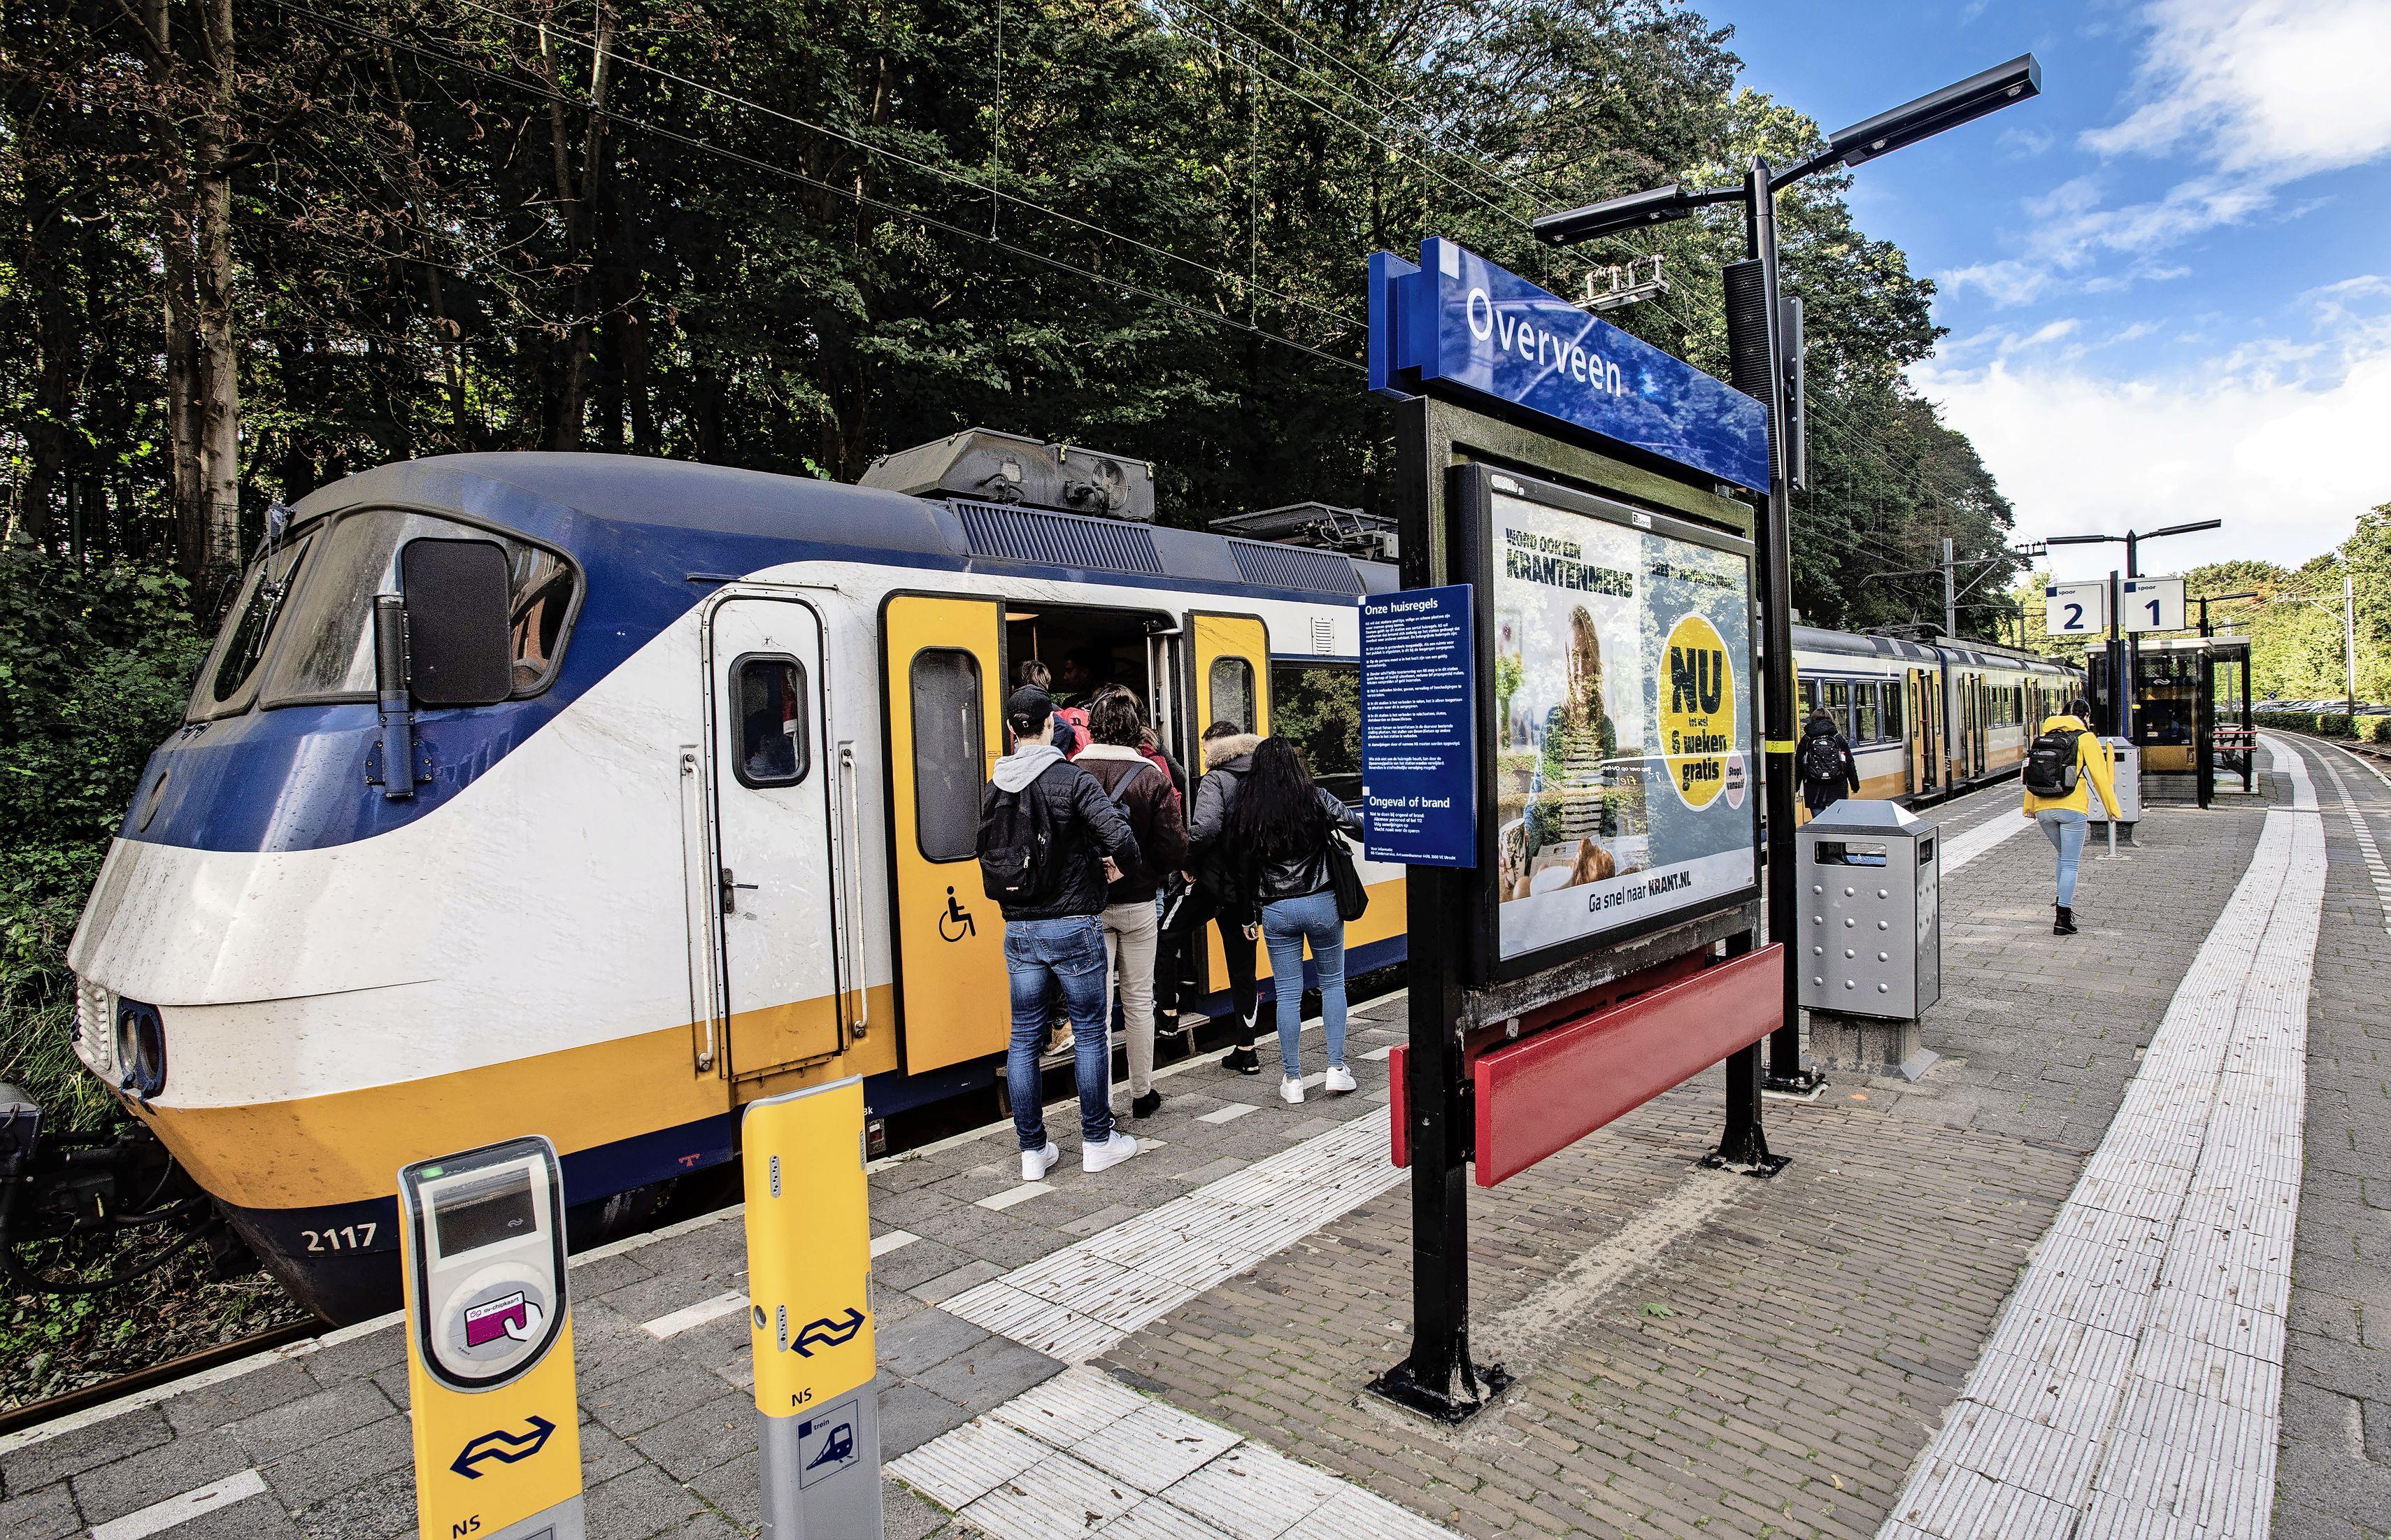 Overveen populairste NS-station van Noord-Holland, ook Haarlem en Bloemendaal scoren hoog